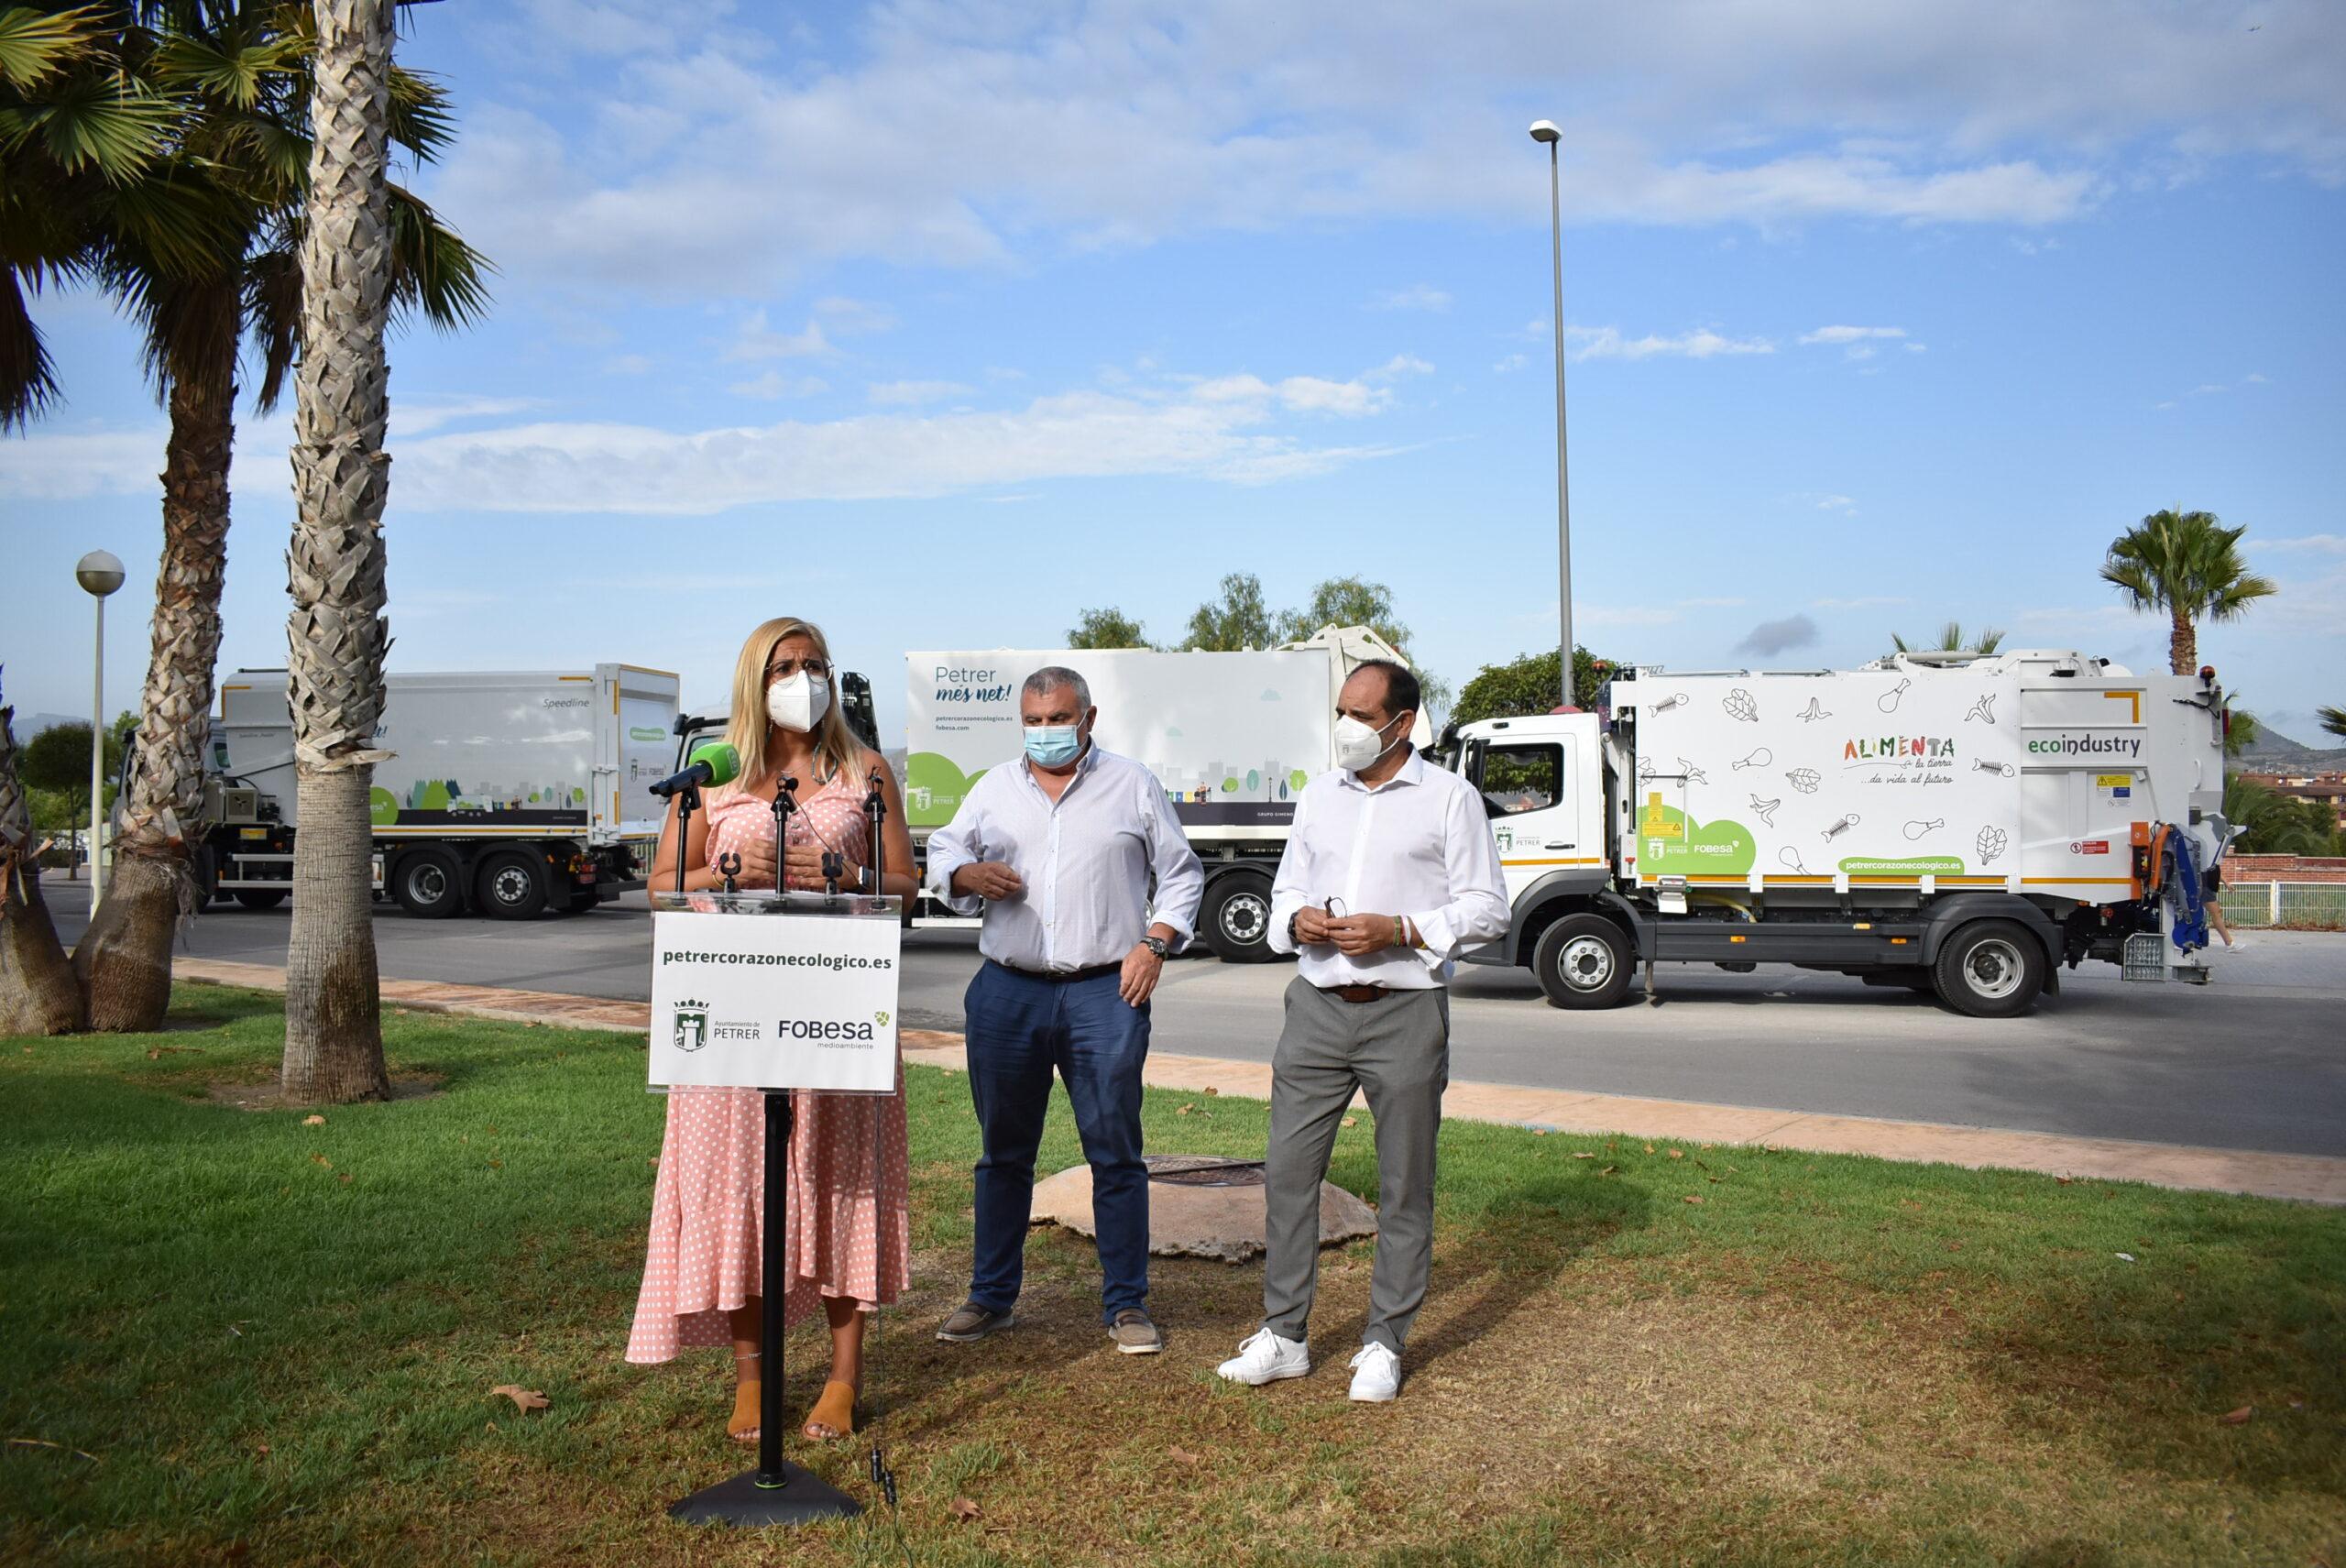 petrer-camiones-fobesa-alicante-sostenible-silencioso